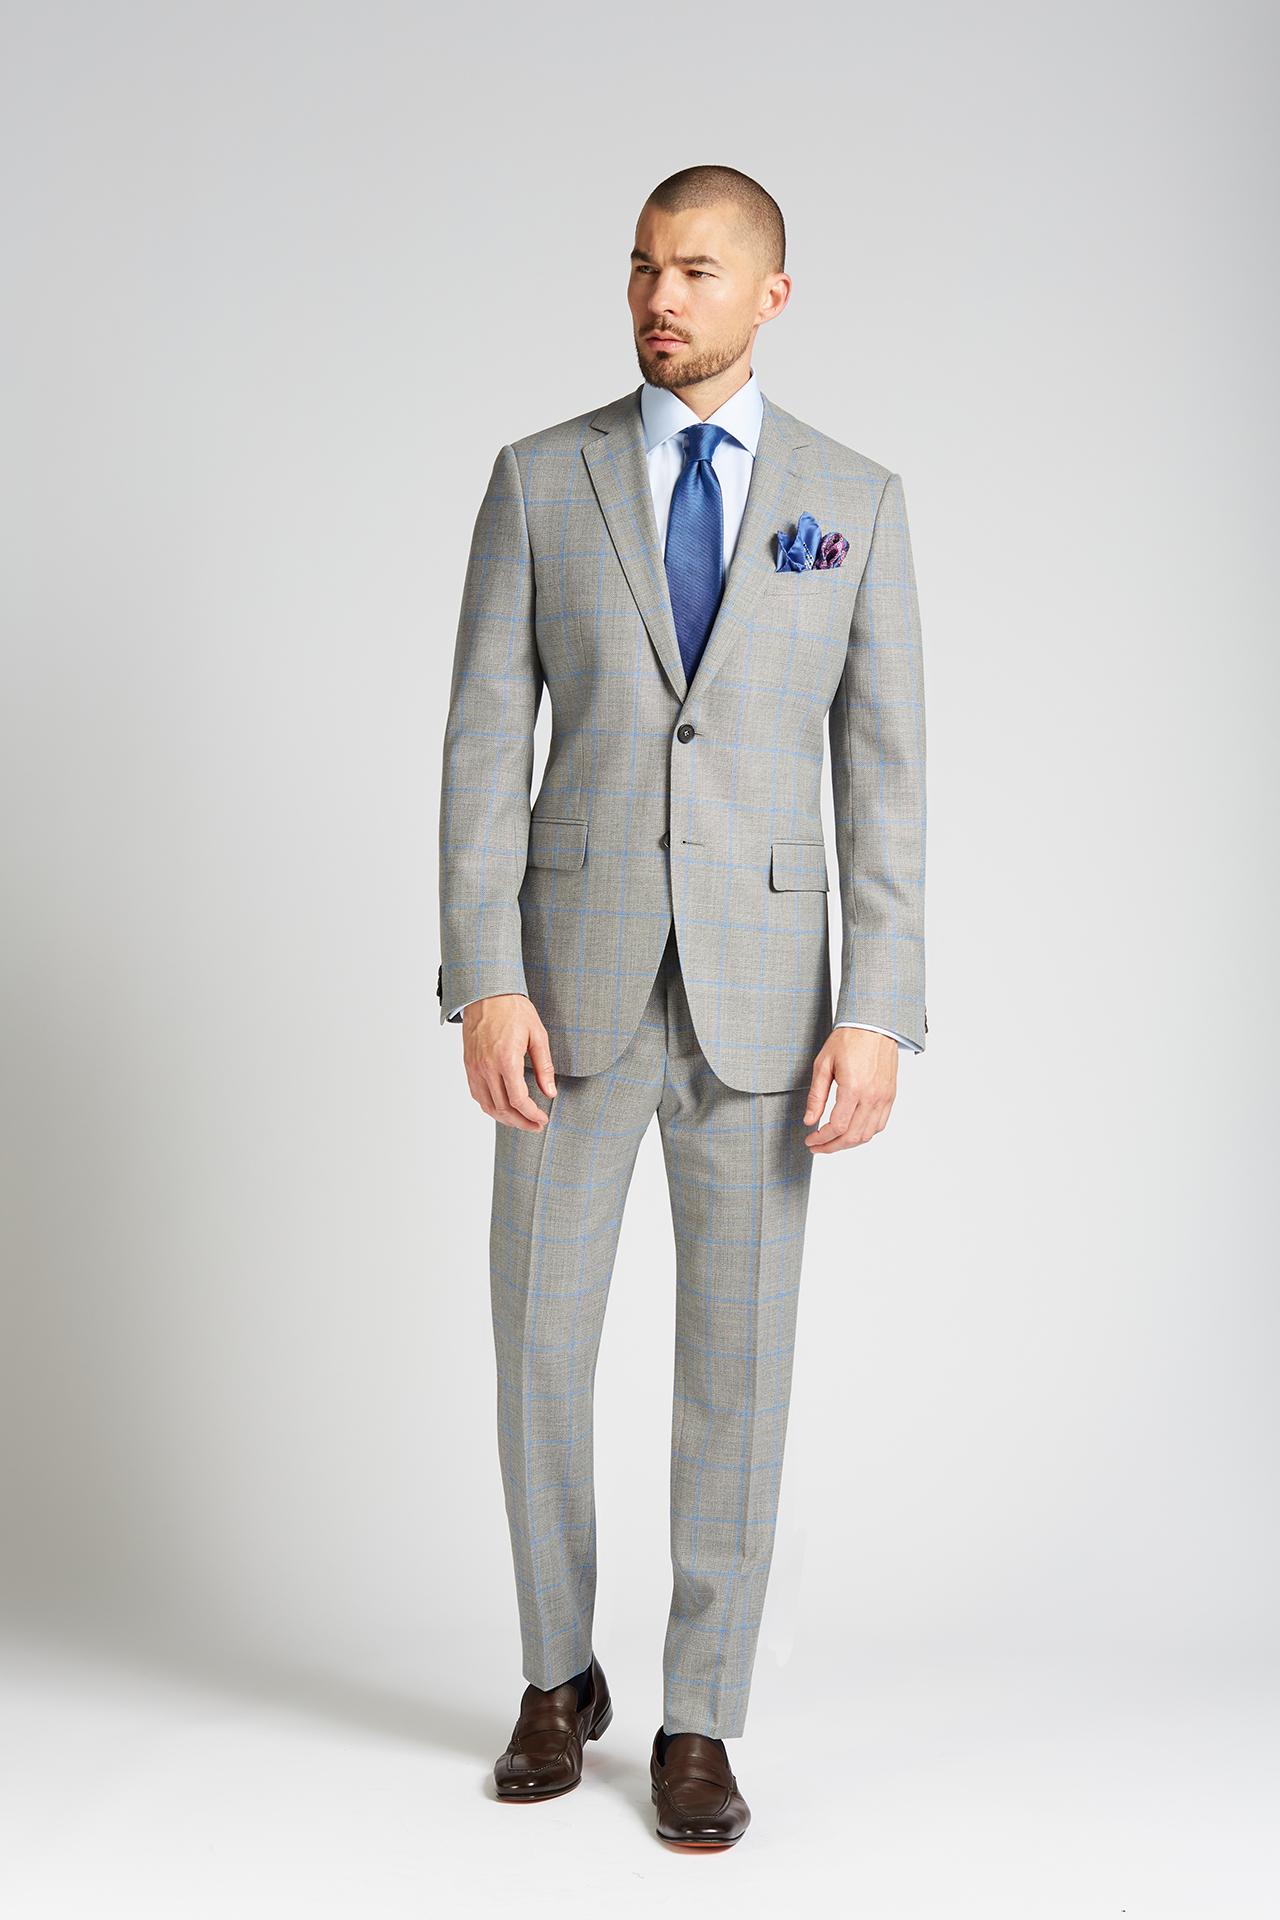 38c3747e5fbf23 August McGregor | Slim-fit 4-Season Wool 2-Piece Suit in Grey with ...